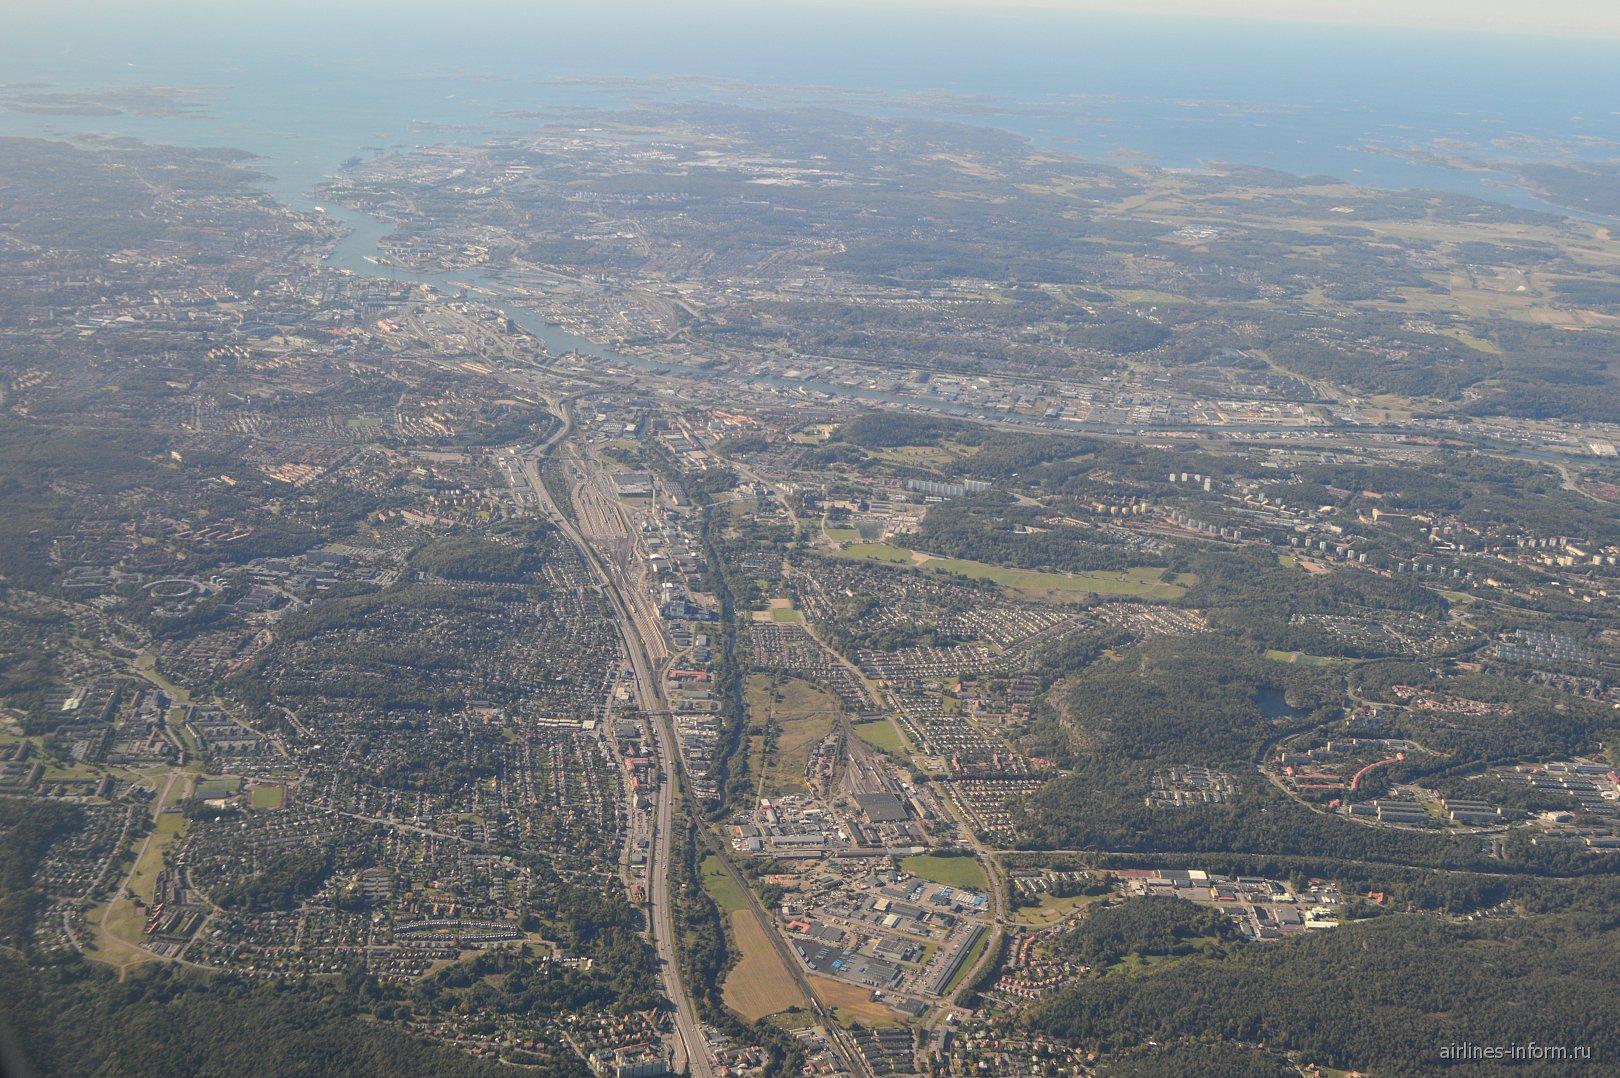 Вид из самолета на шведский город Гётеборг